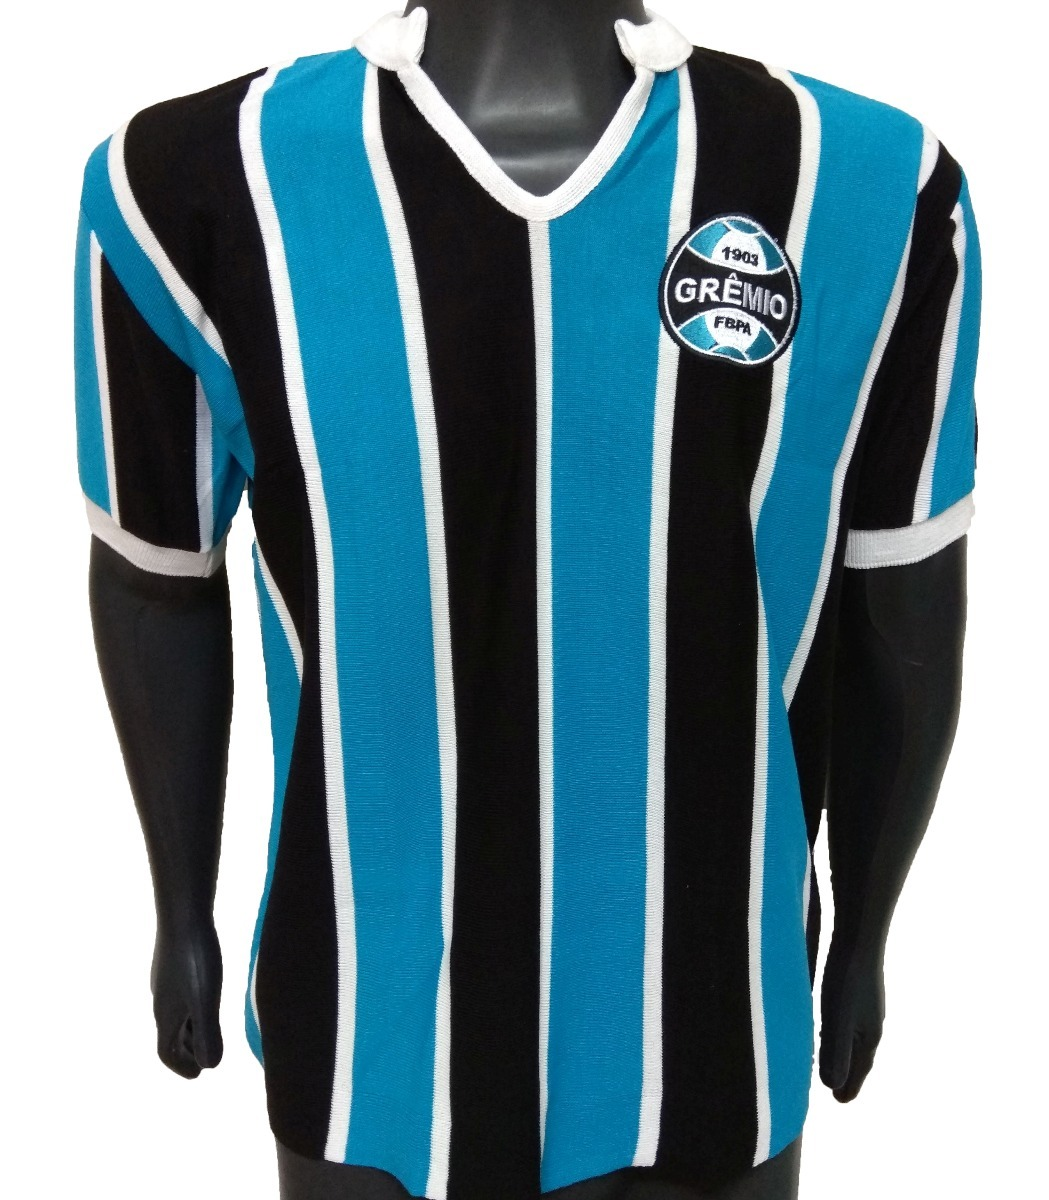 cdc26ccd5c Baby Look Retrô Grêmio 1980 - R$ 139,00 em Mercado Livre